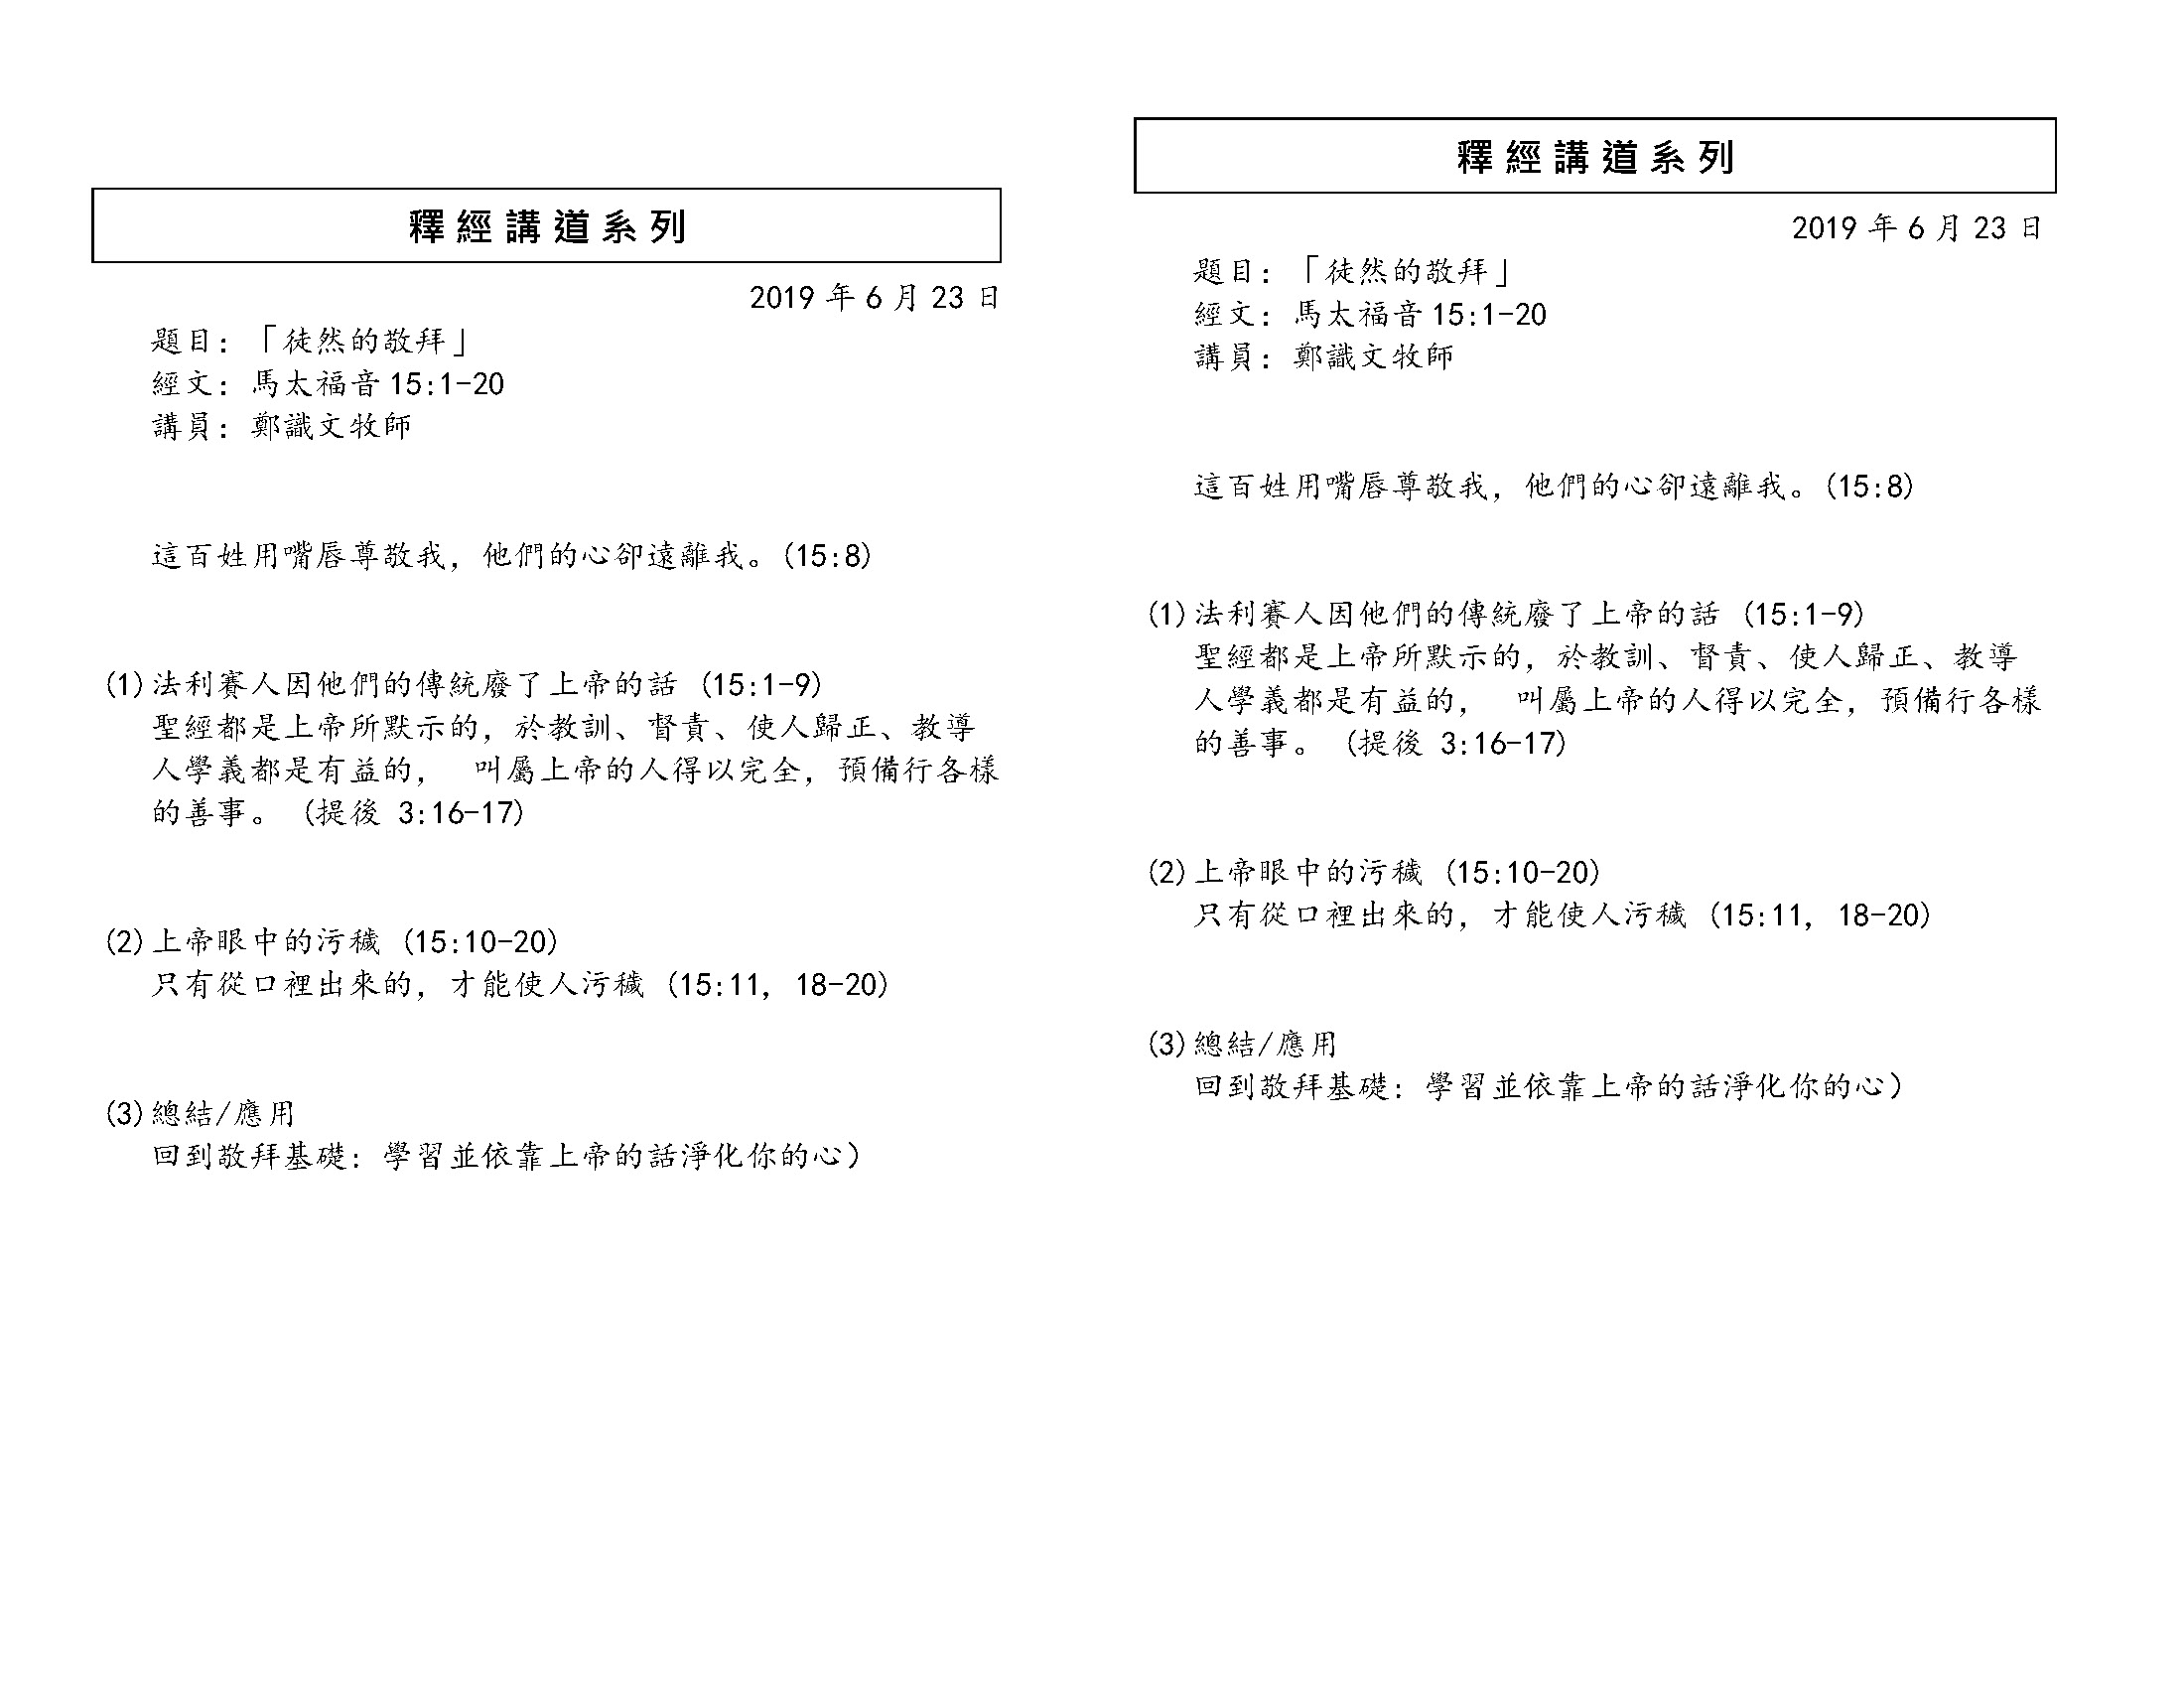 Chinese Bulletin 2019-6-23_Page_3.jpg